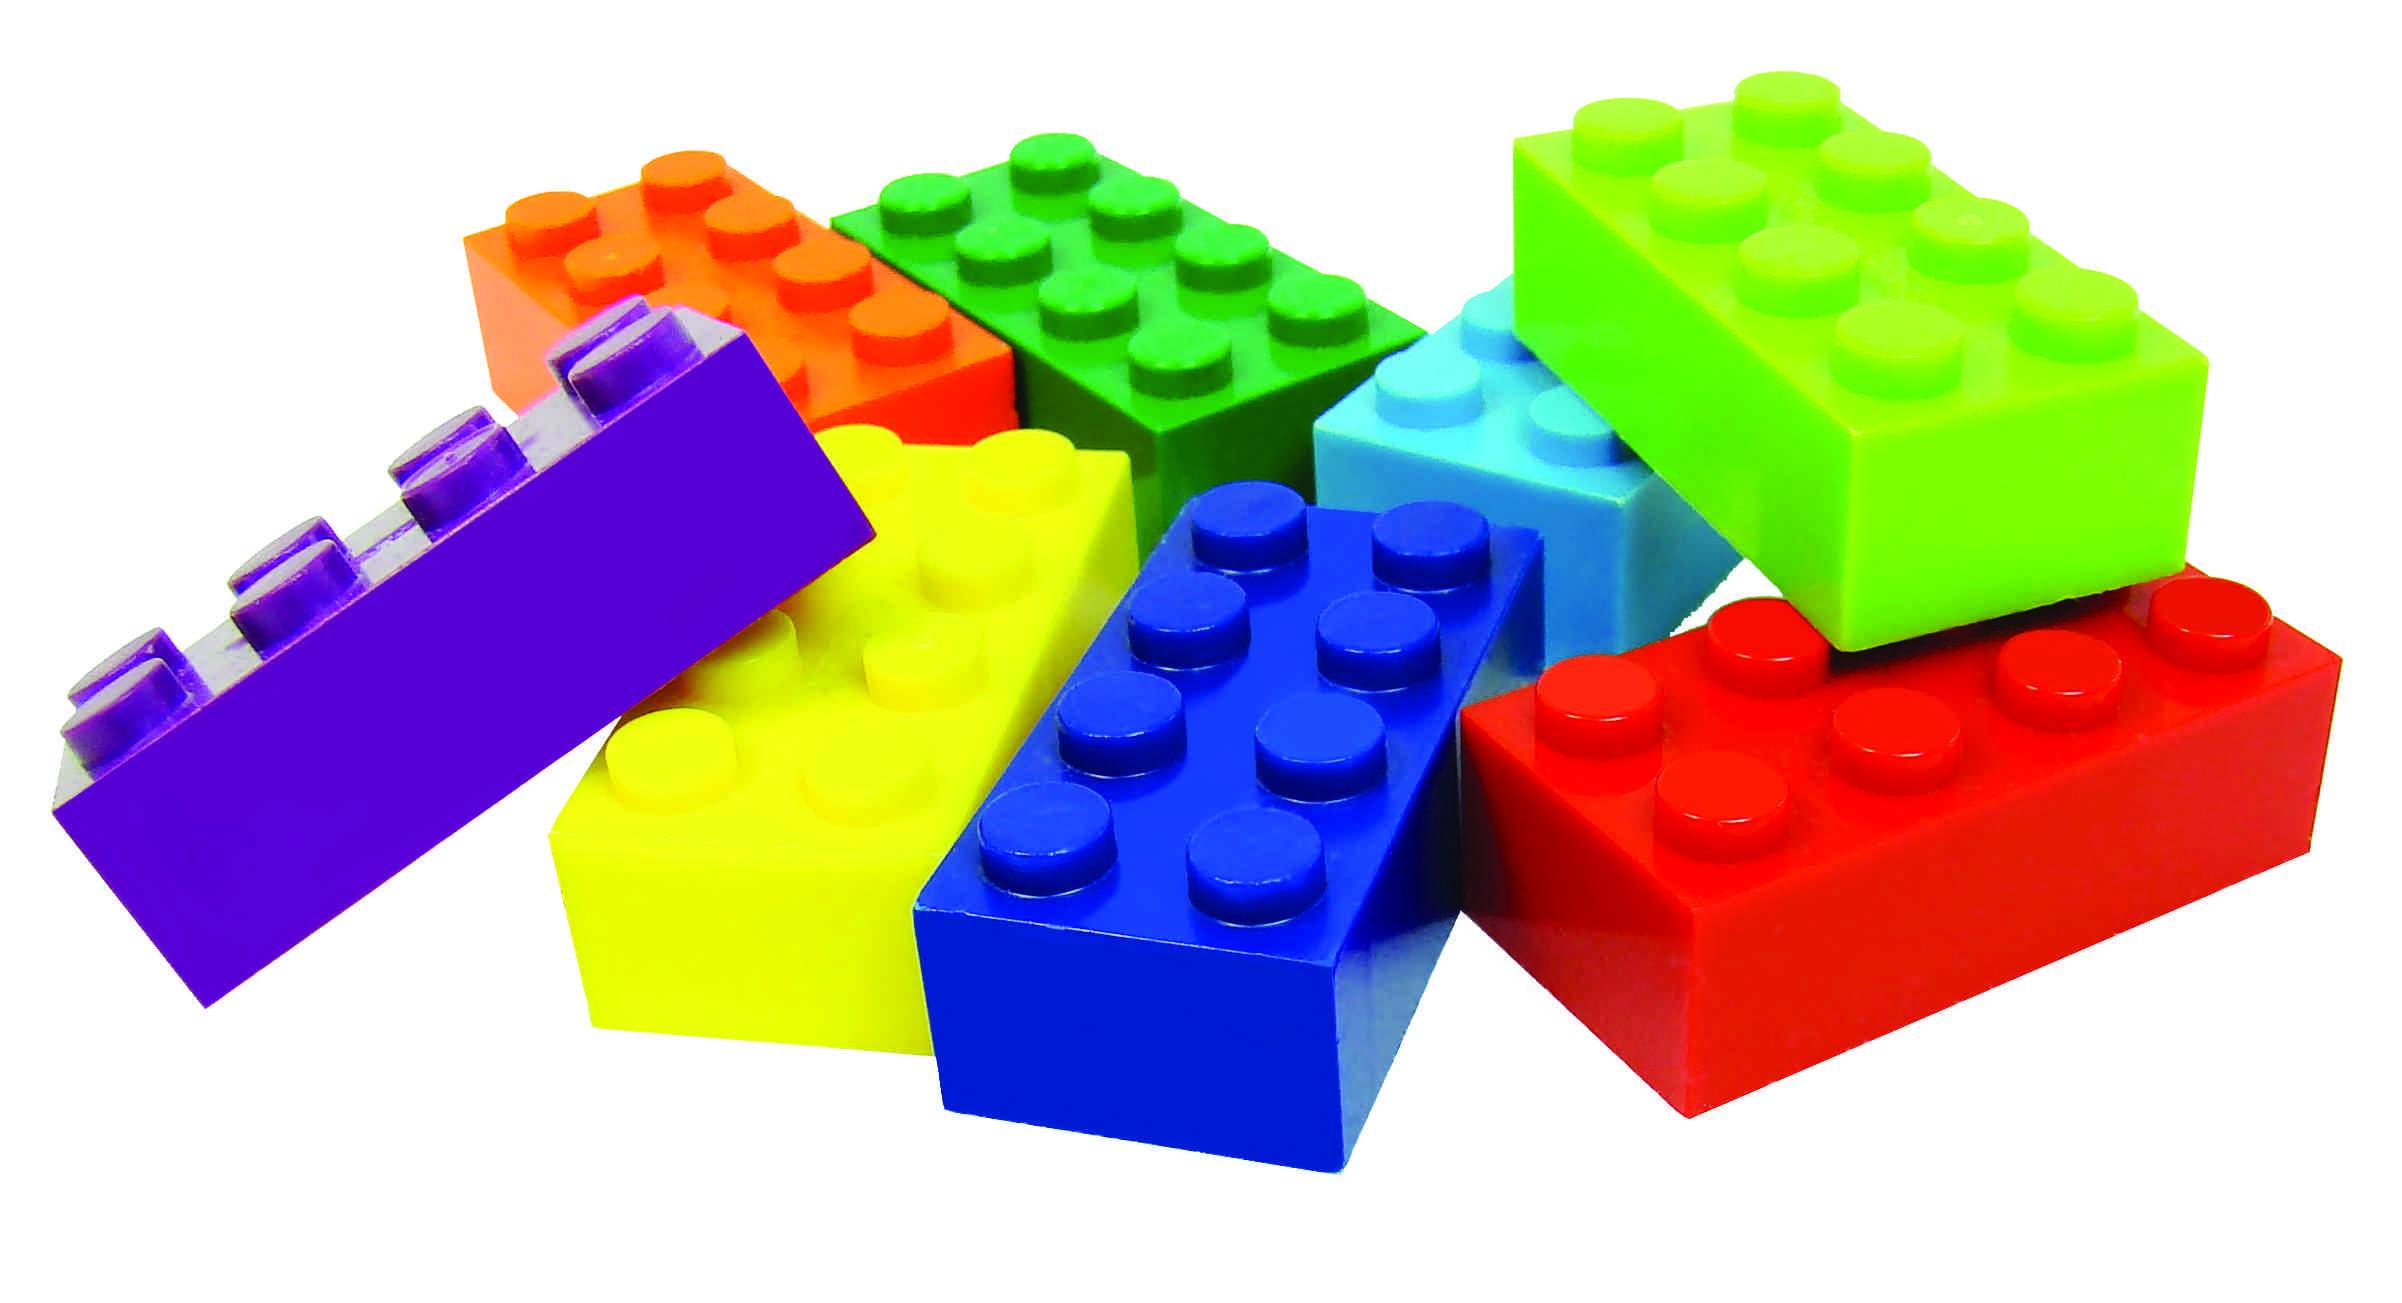 Lego Bricks Clipart Lego bricks clipart lego brick.